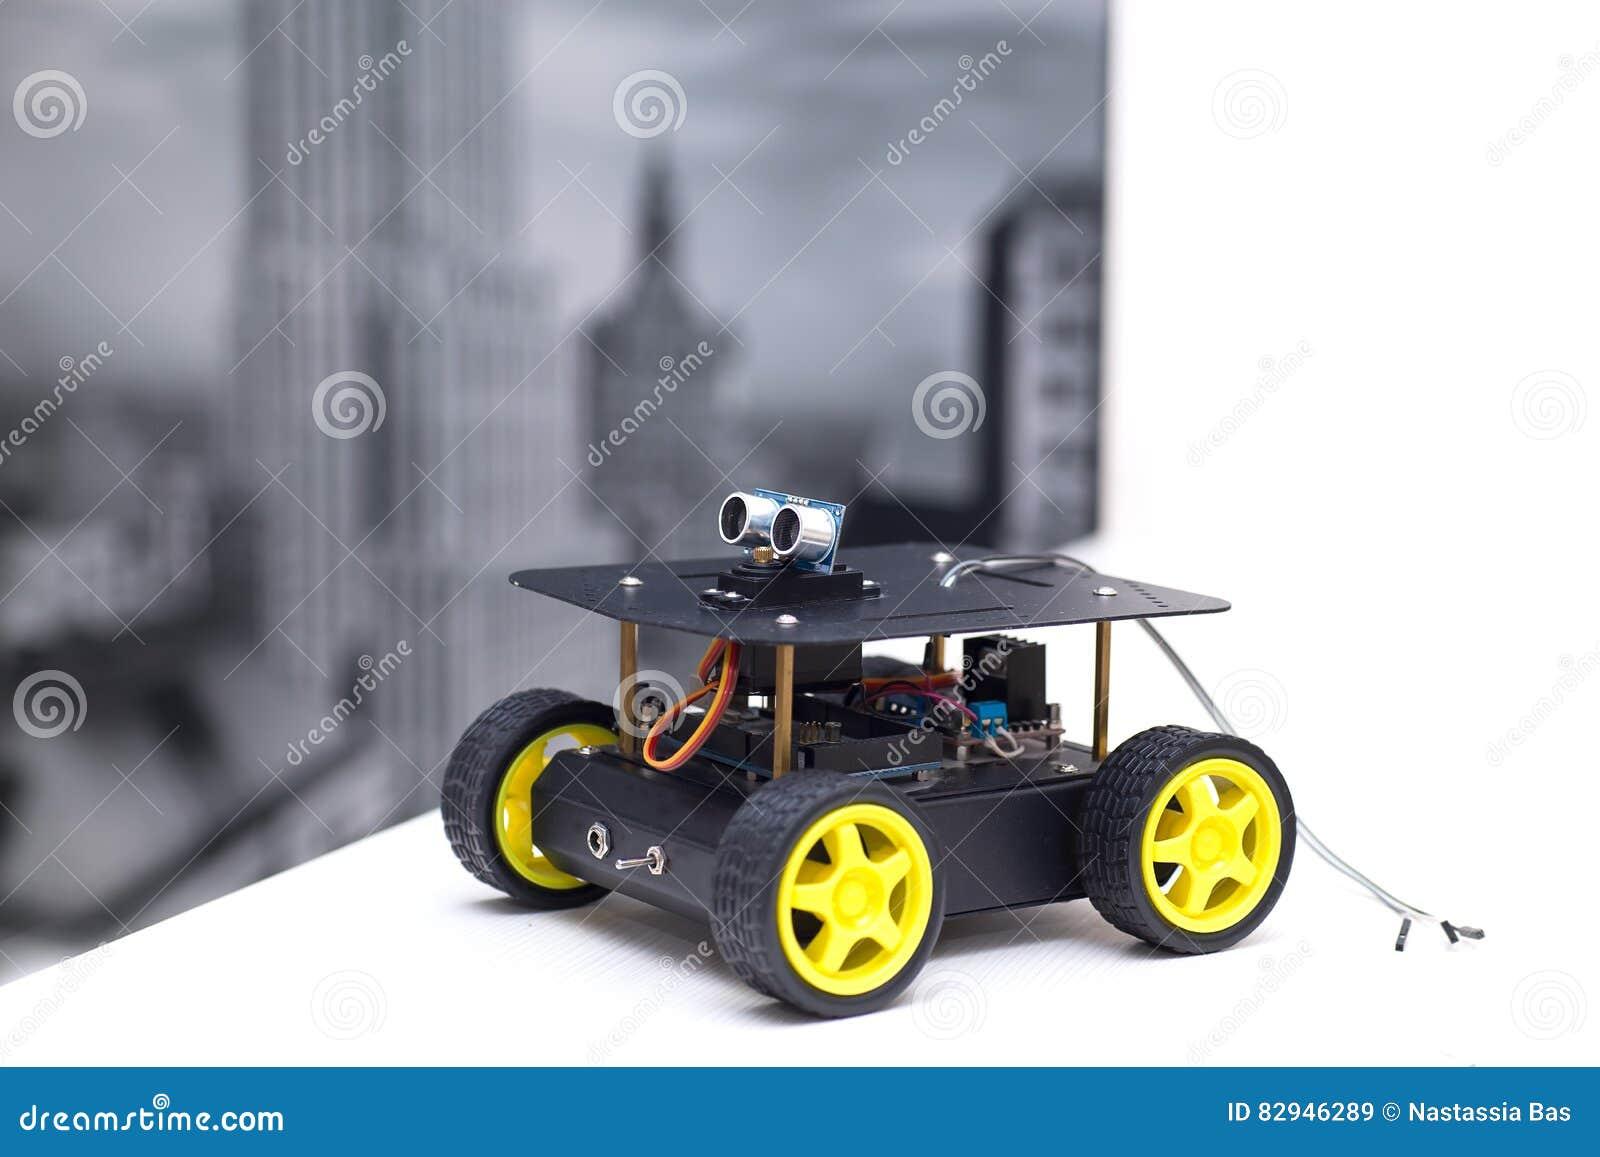 Superb Metal Robot With Yellow Wheels On A White Table Stock Image Interior Design Ideas Tzicisoteloinfo